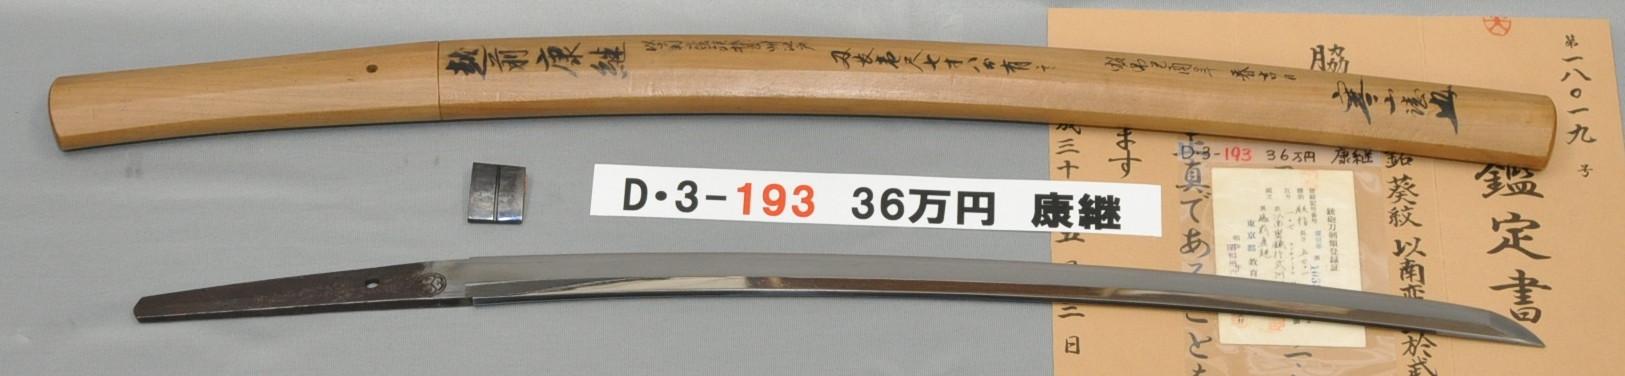 D3193